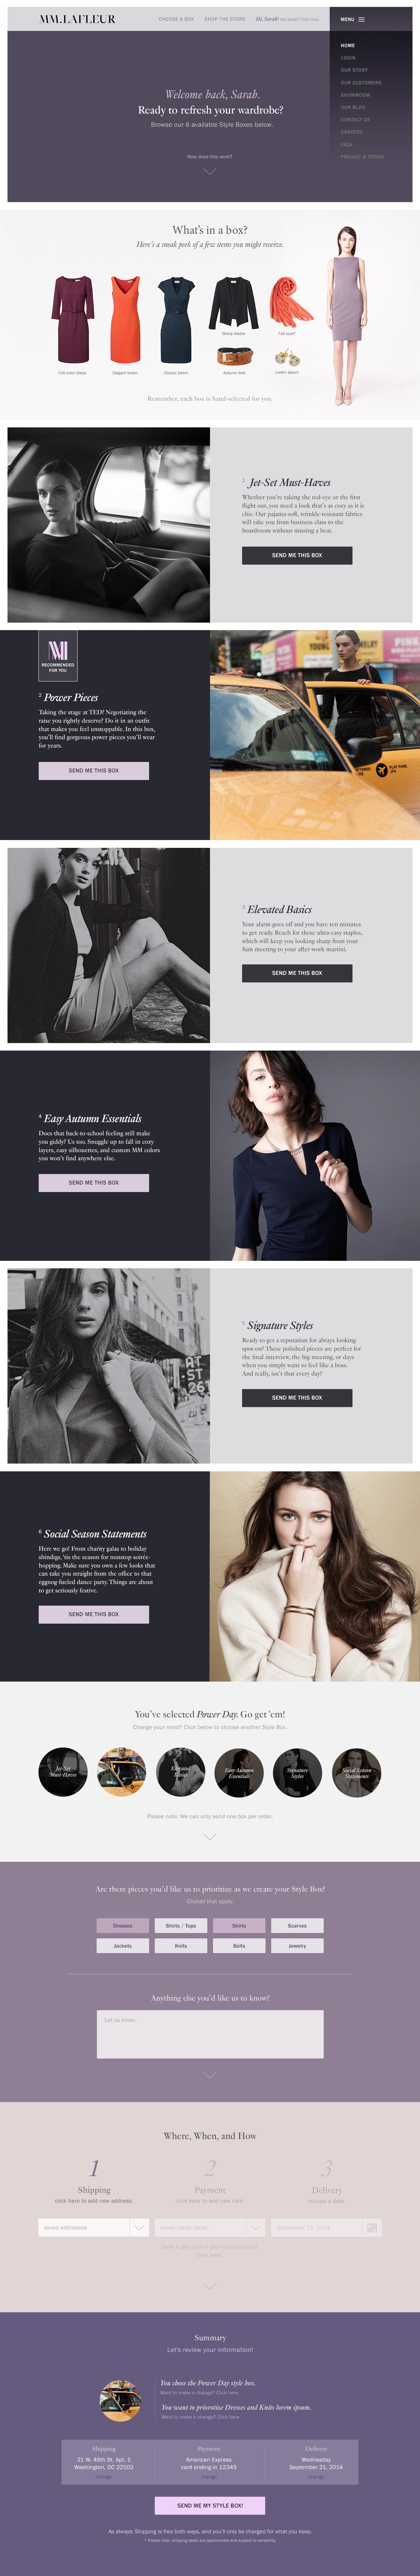 MML-returning-customer-page.jpg